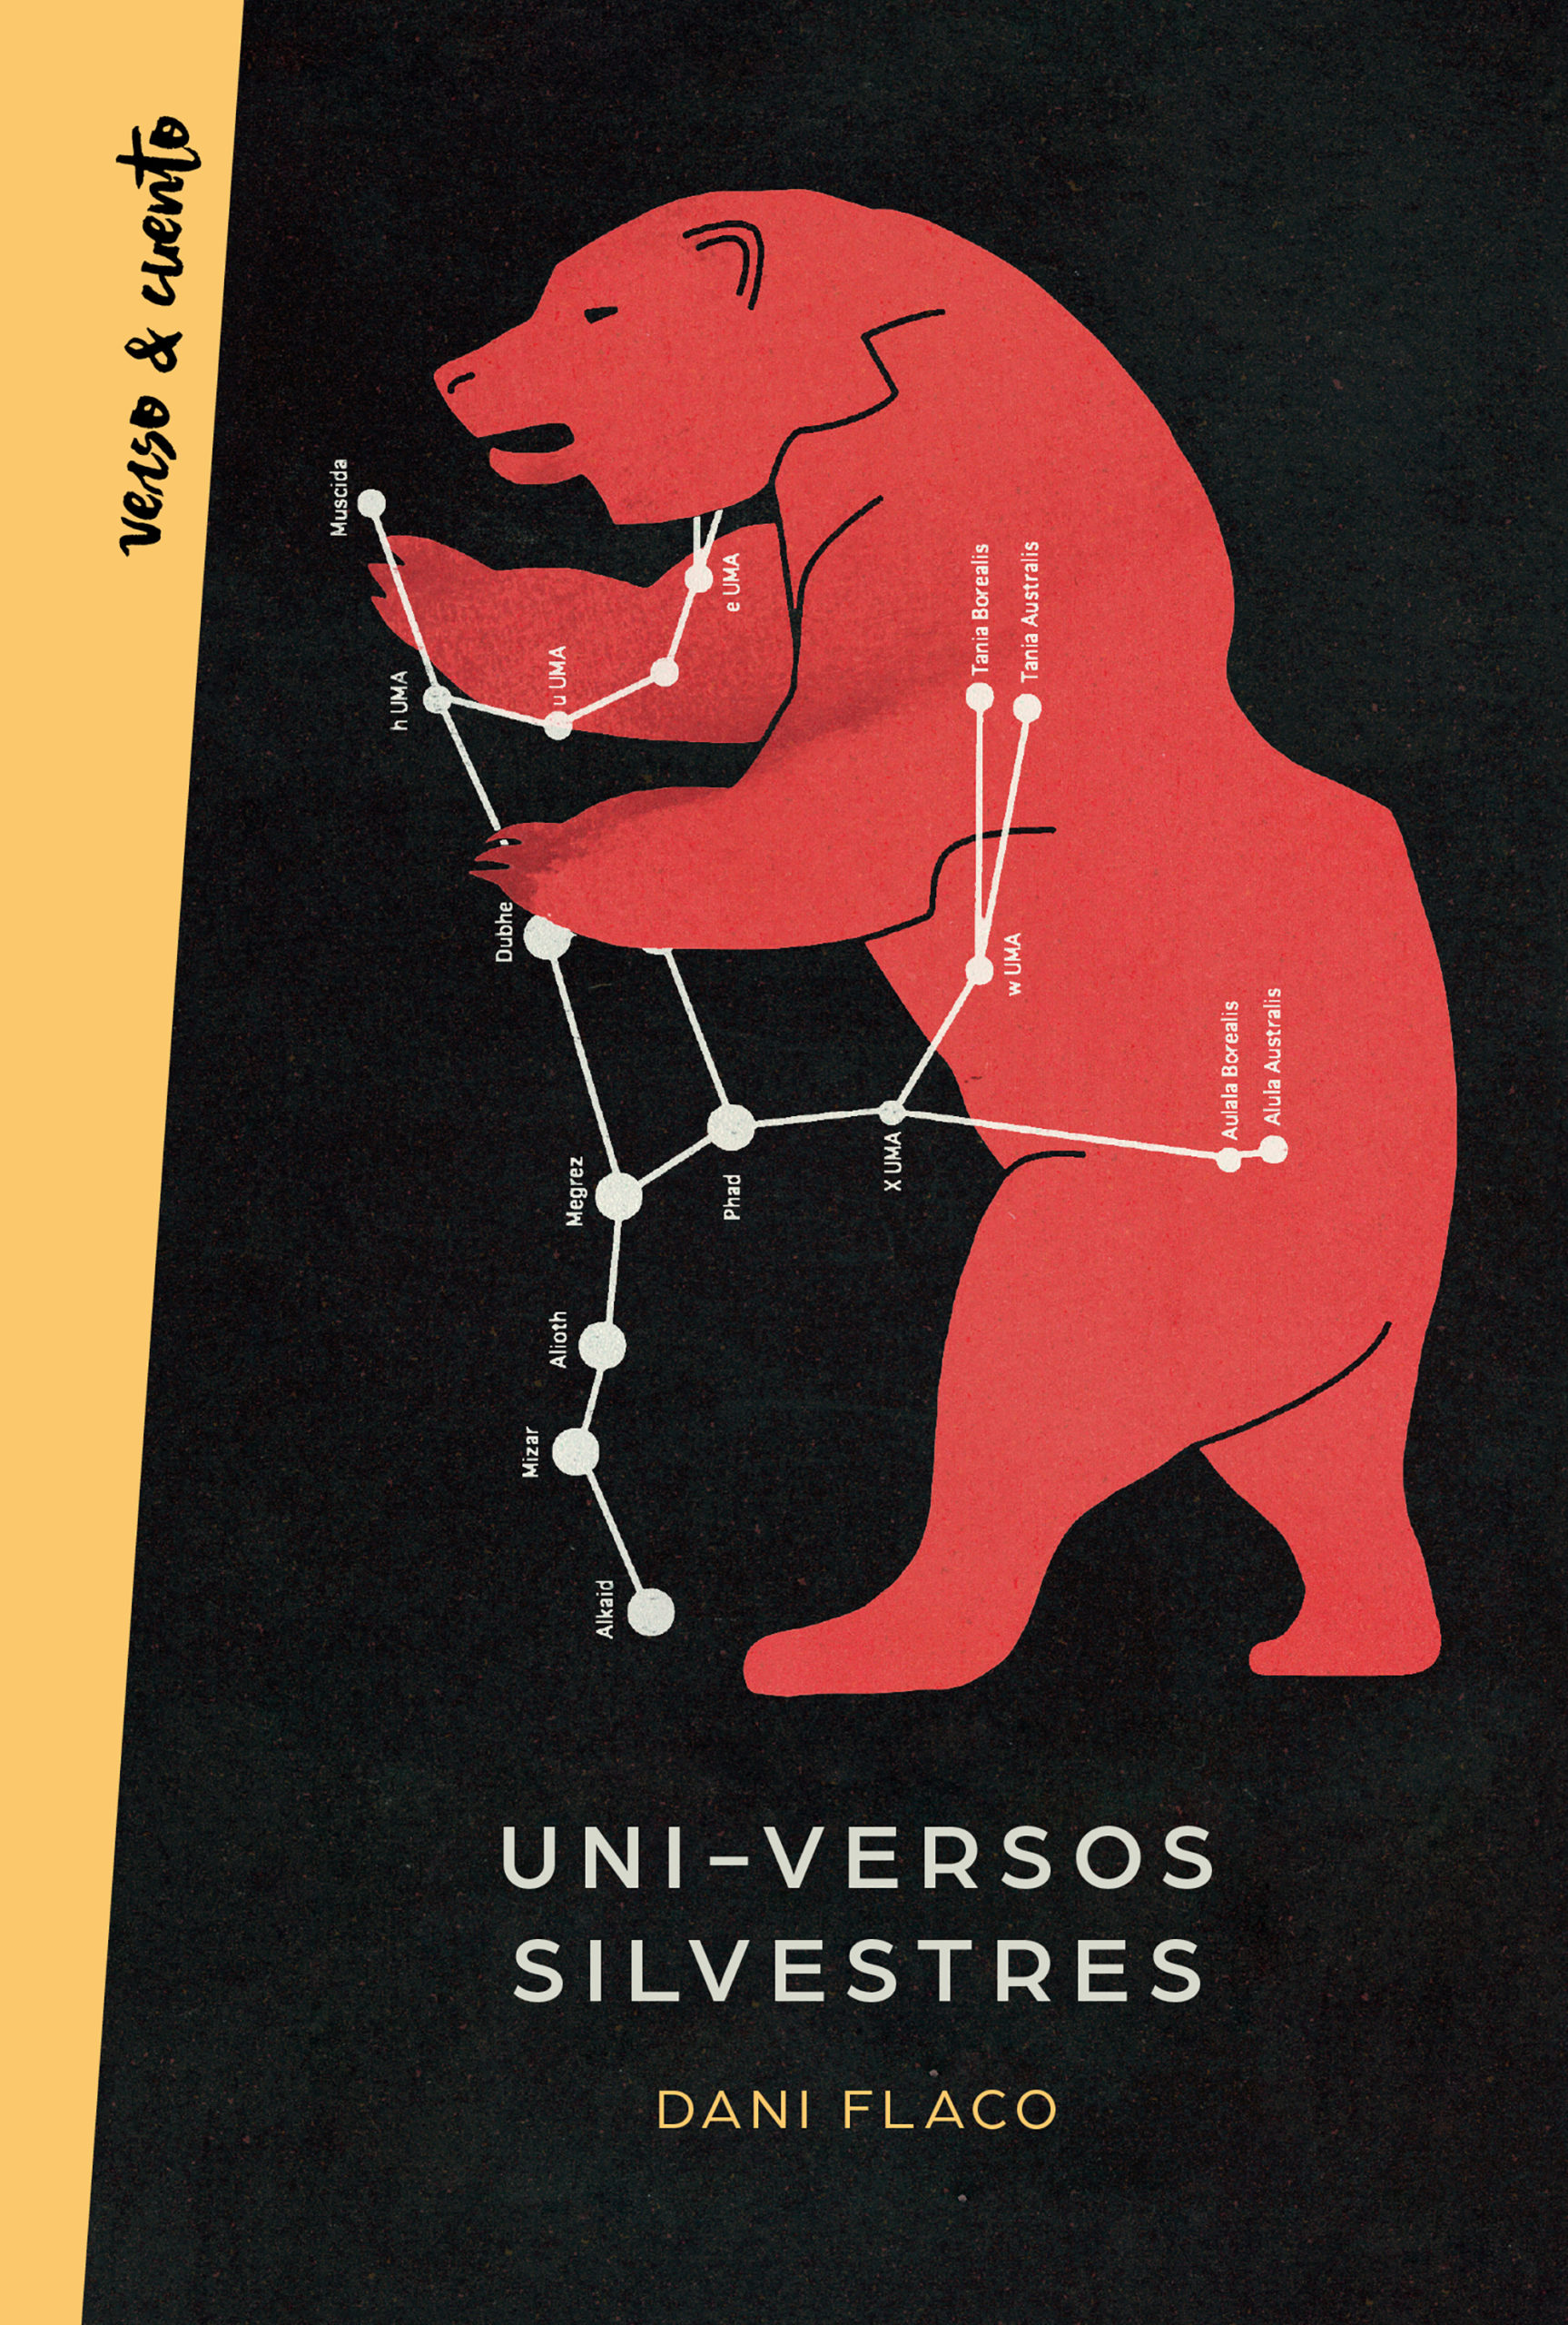 Uni-Versos Silvestres - Dani Flaco